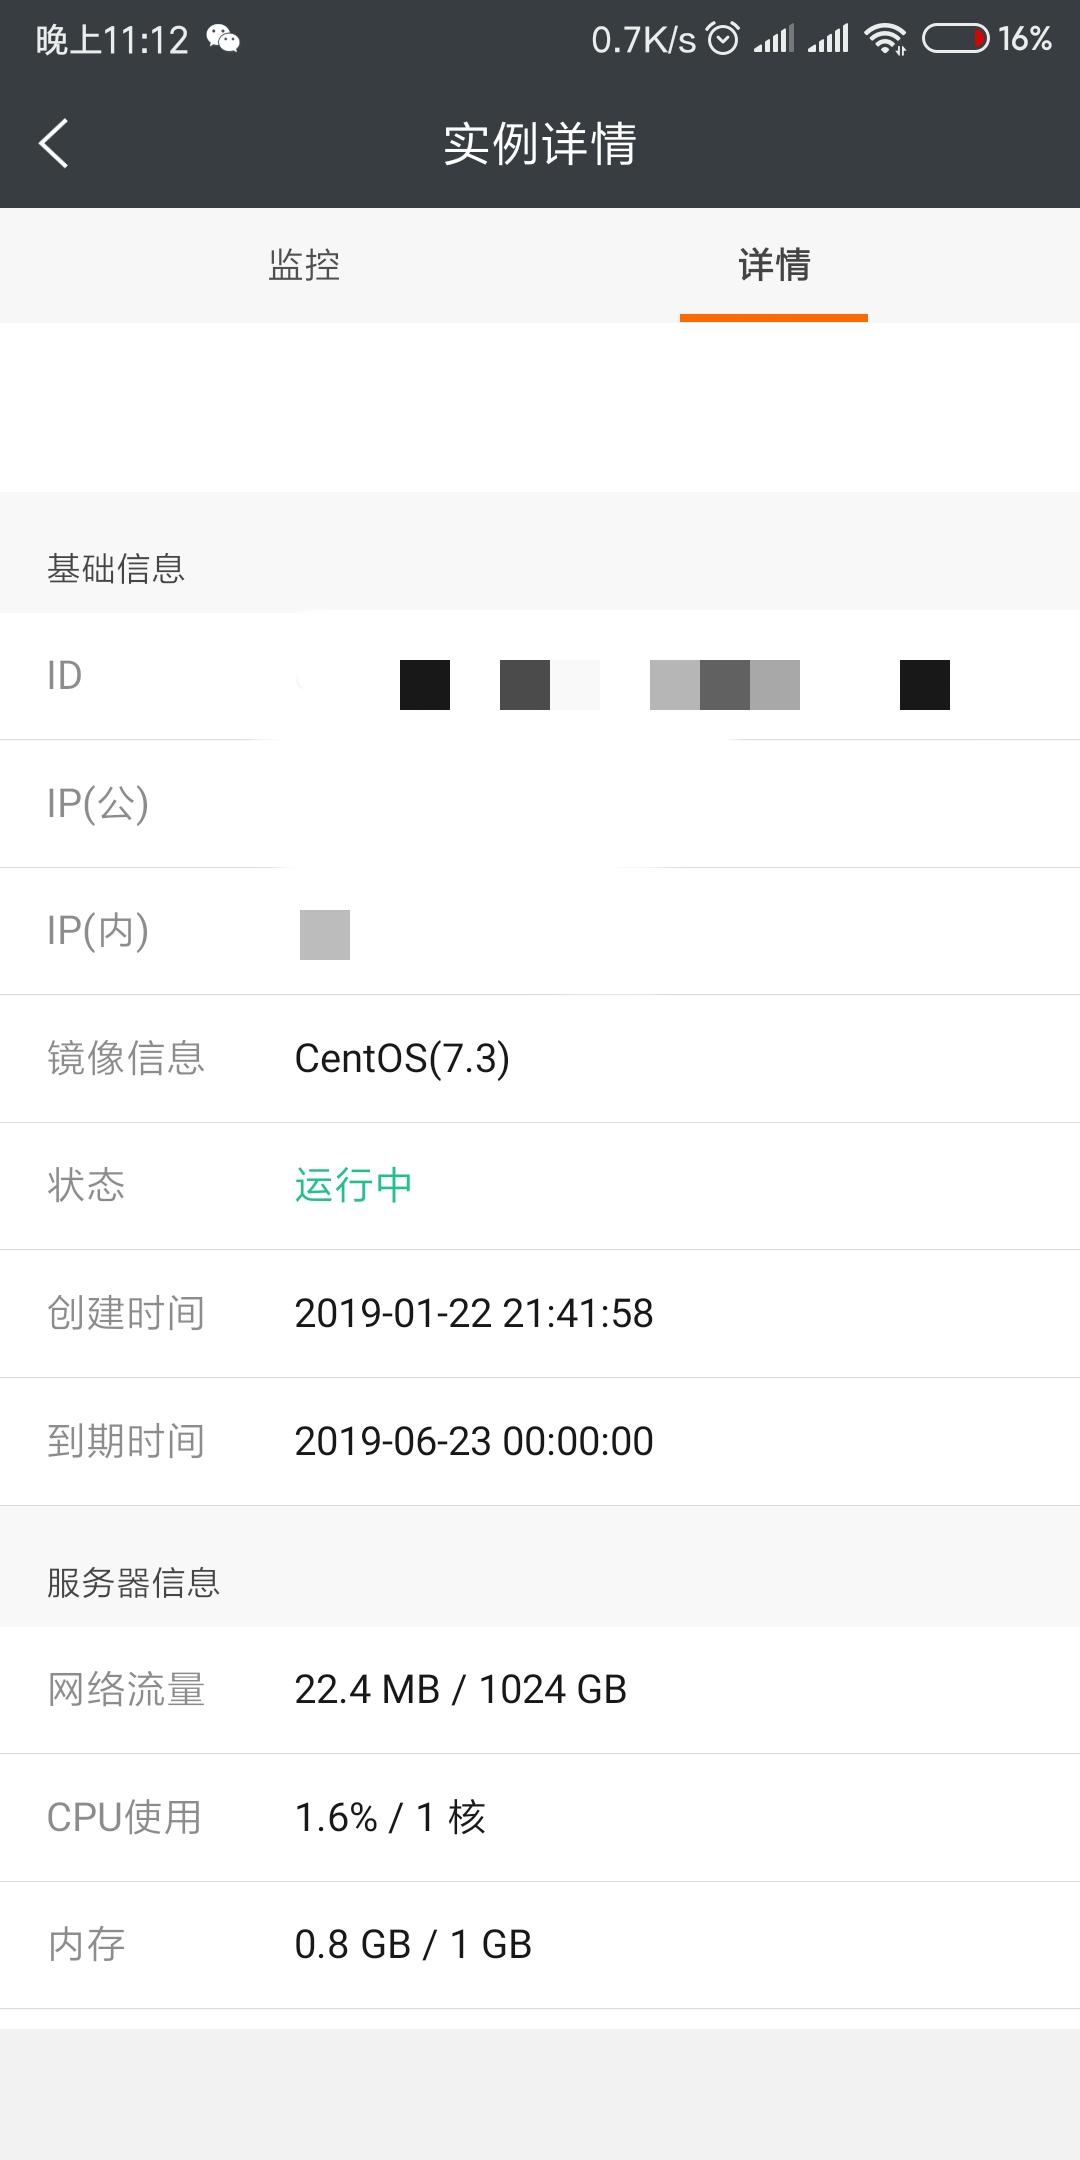 Screenshot_2019-06-03-23-12-08-630_com.alibaba.aliyun.png